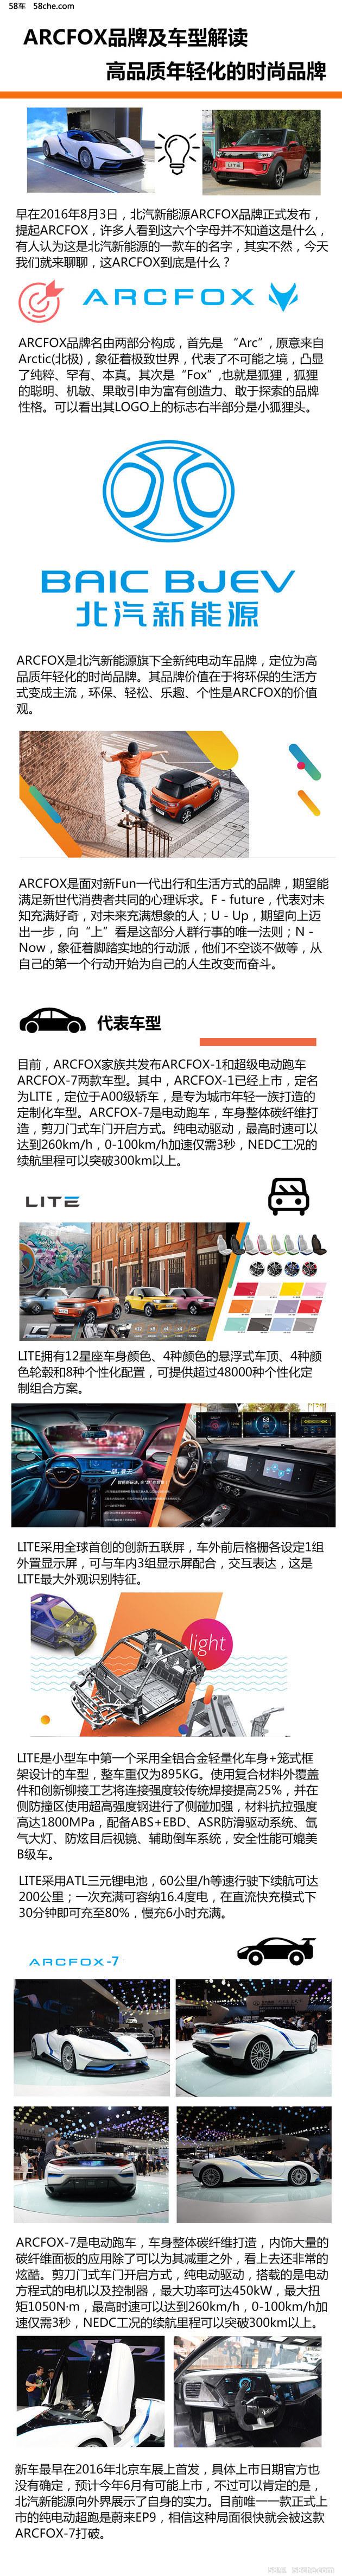 ARCFOX品牌解读及车型简介 高品质年轻化